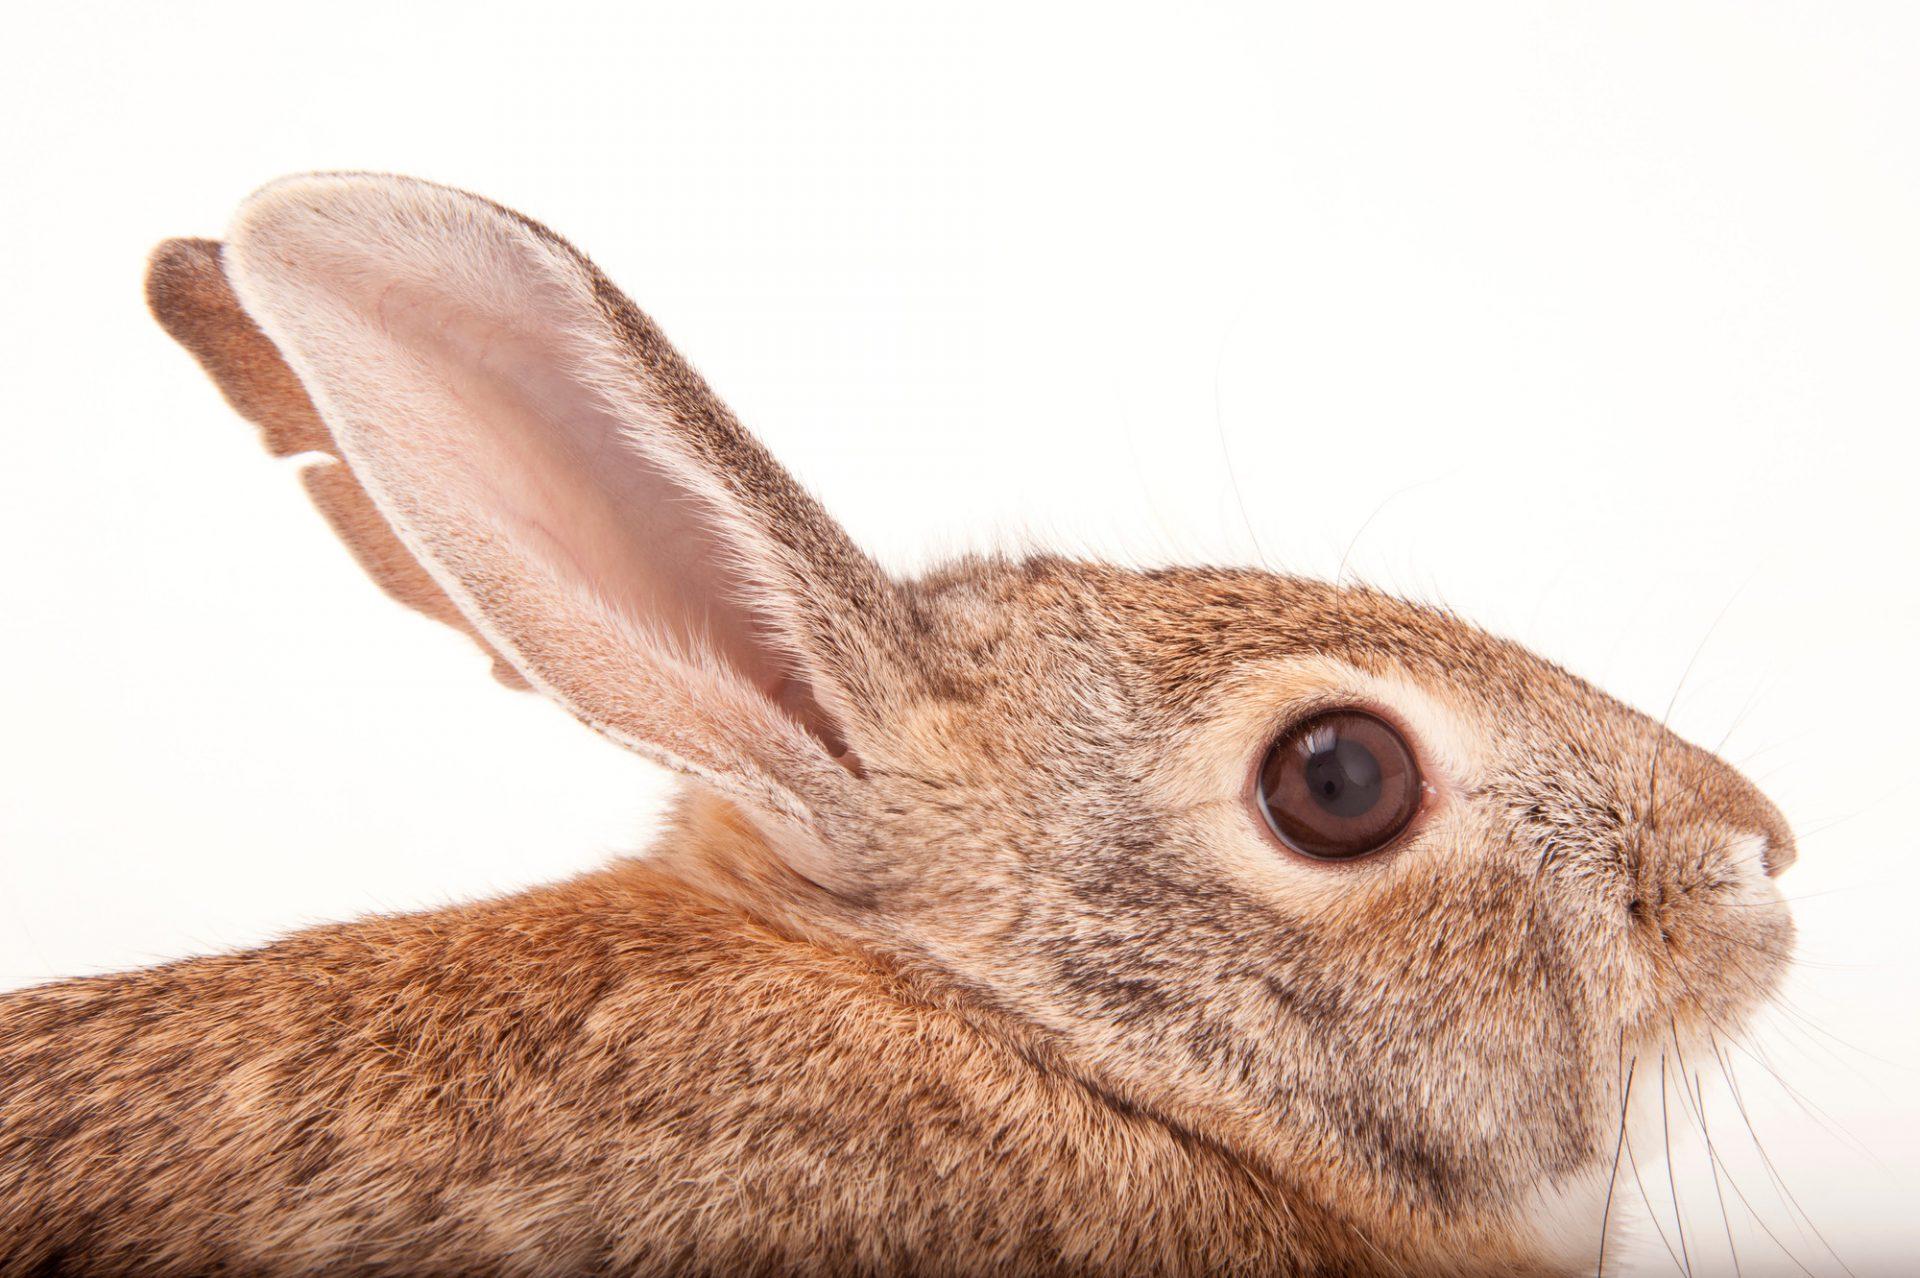 A desert cottontail rabbit (Sylvilagus audubonii) at the Omaha Henry Doorly Zoo and Aquarium.